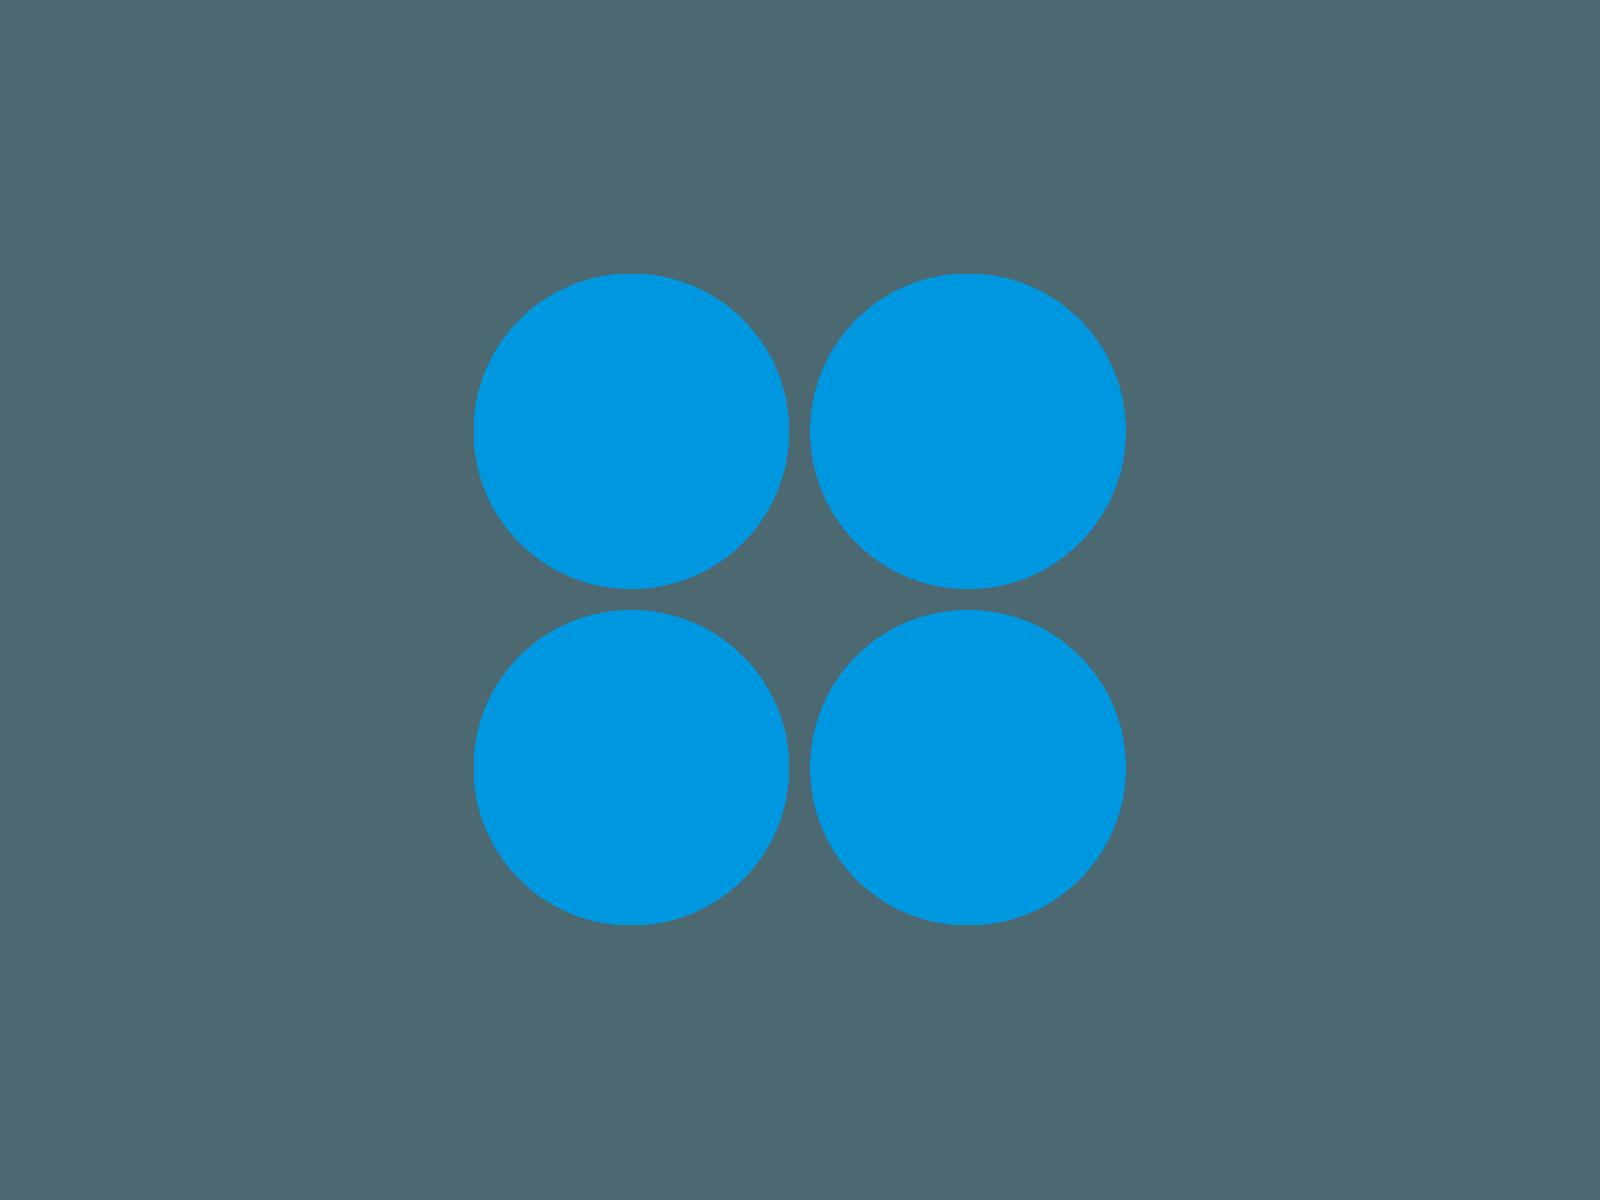 4 Blue Circles Logo.